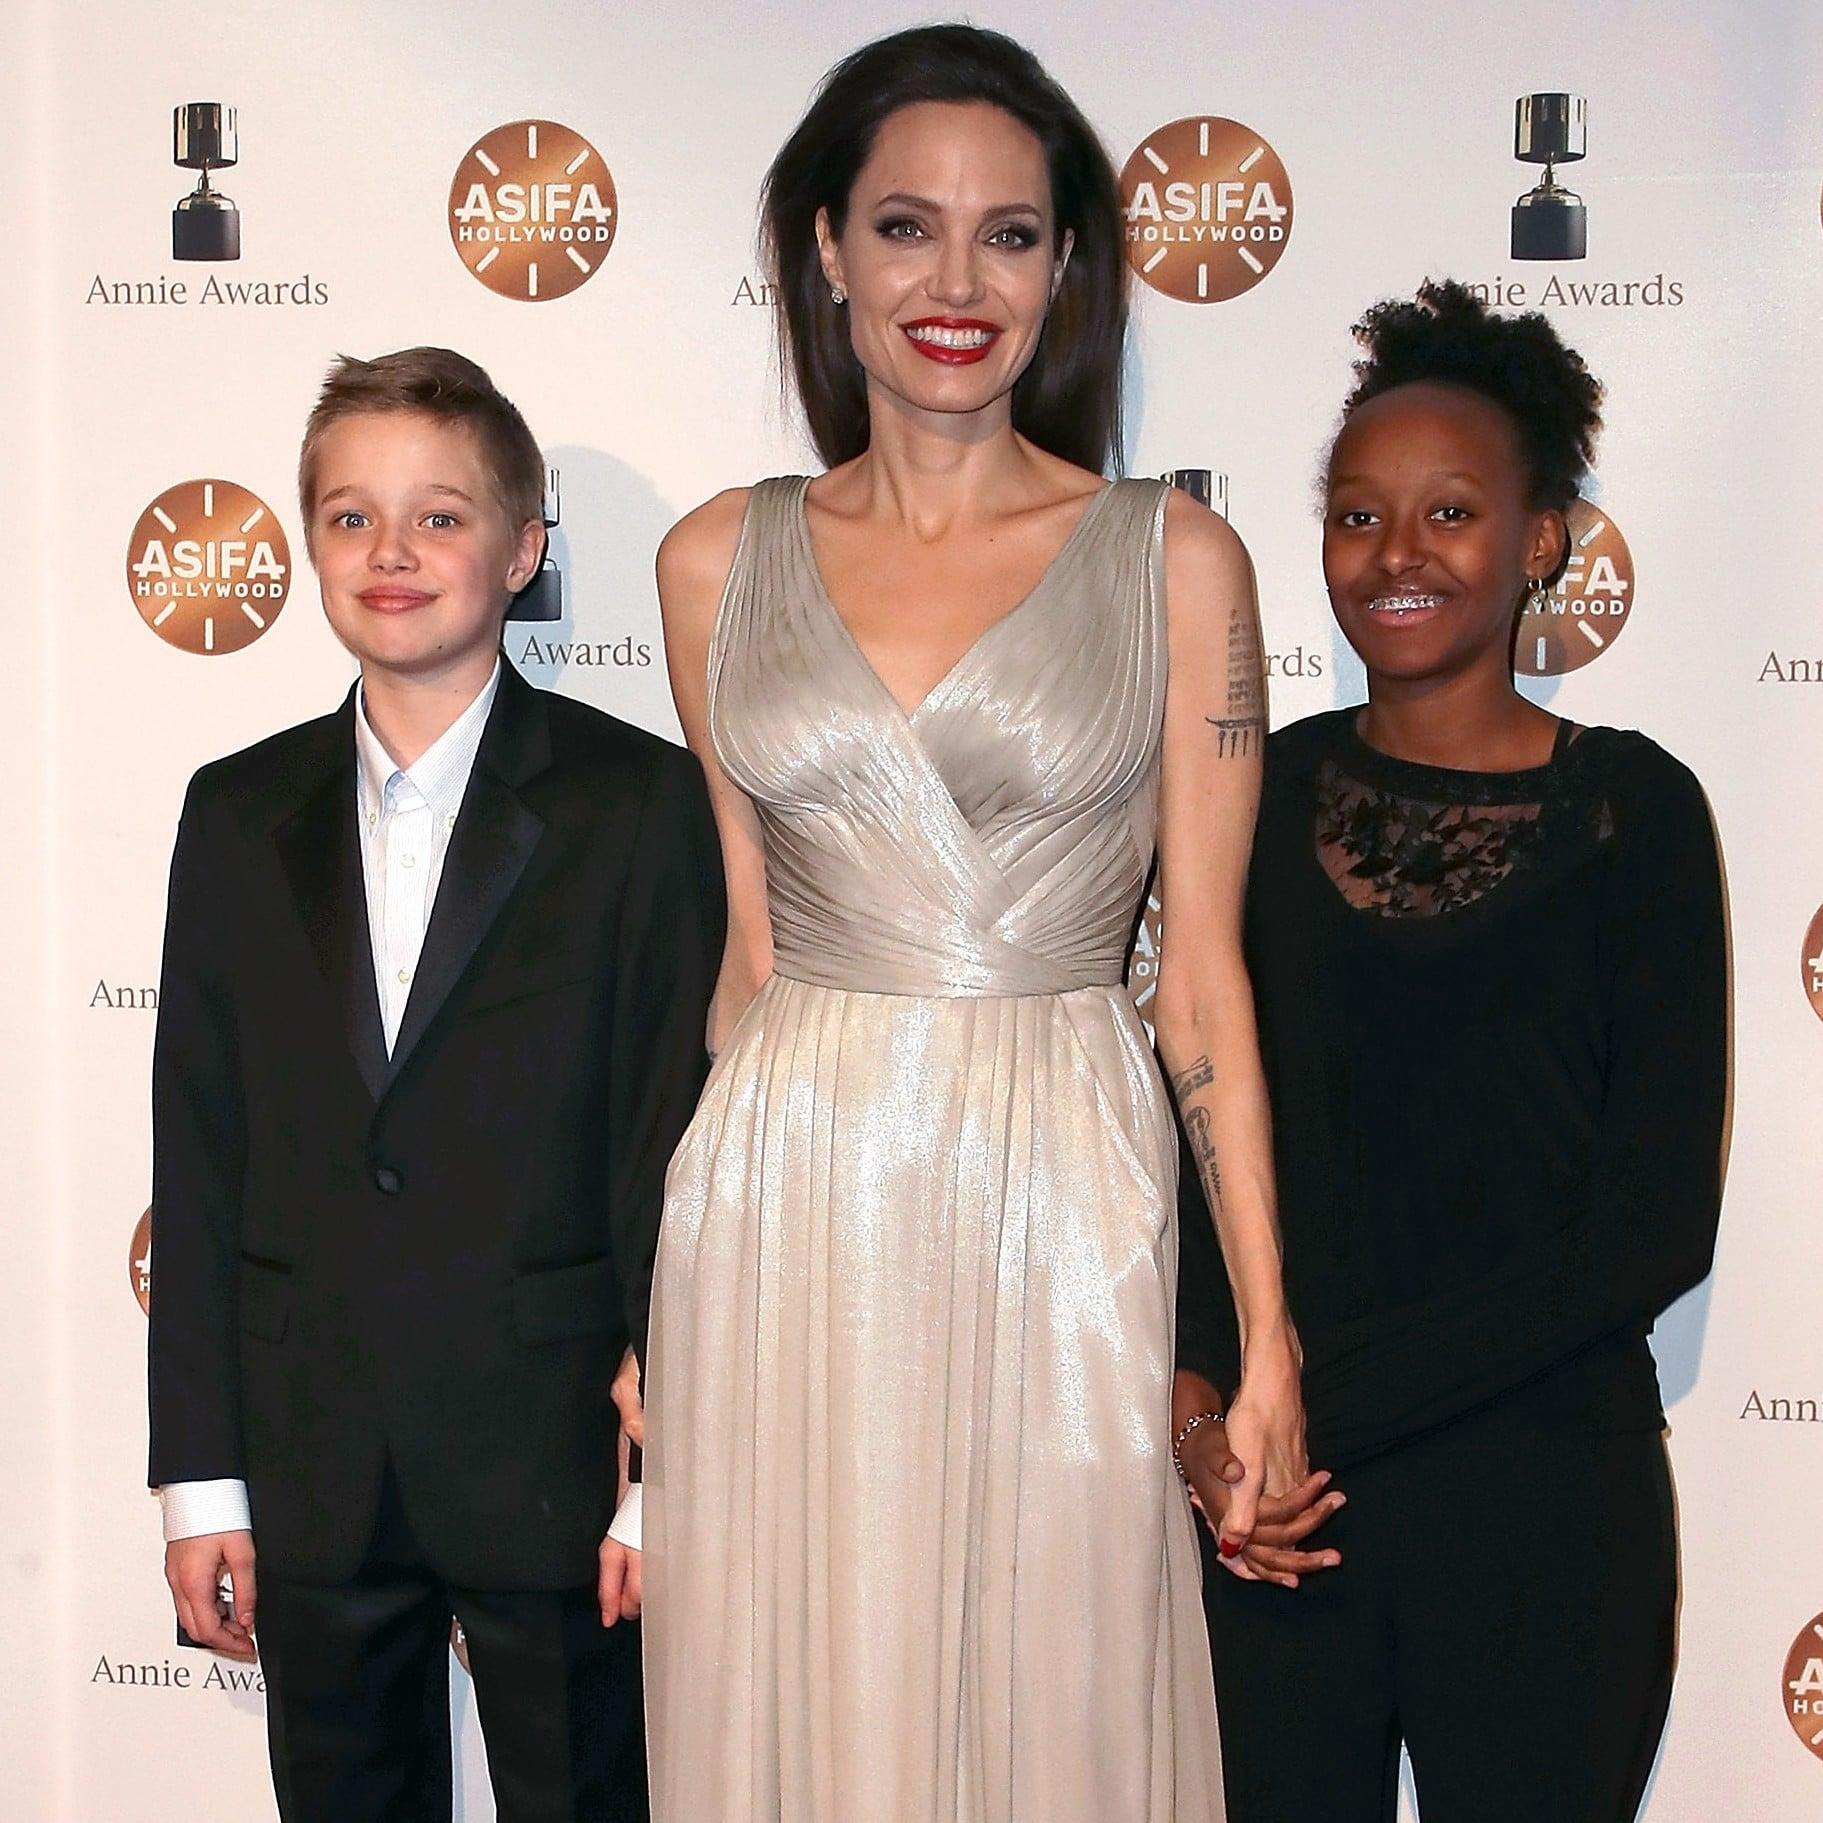 Angelina Jolie Imdb   www.topsimages.com